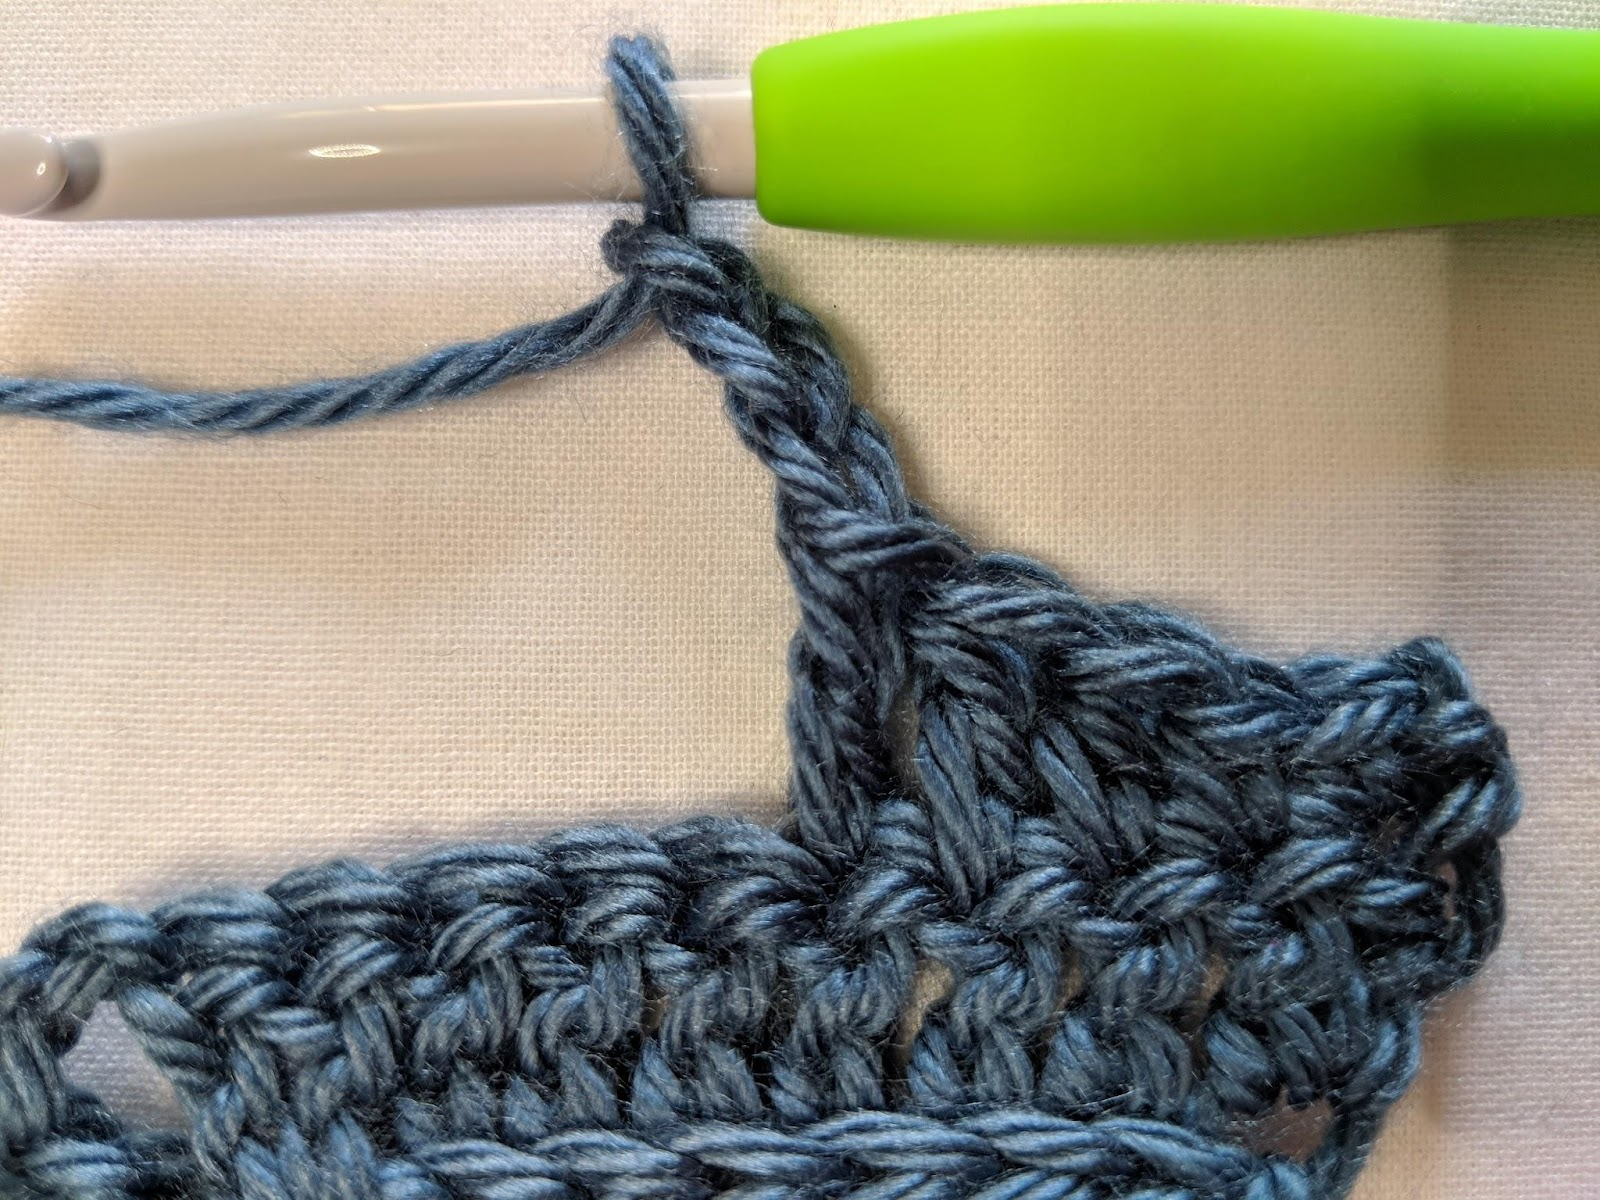 Bead Picot Stitch Tutorial